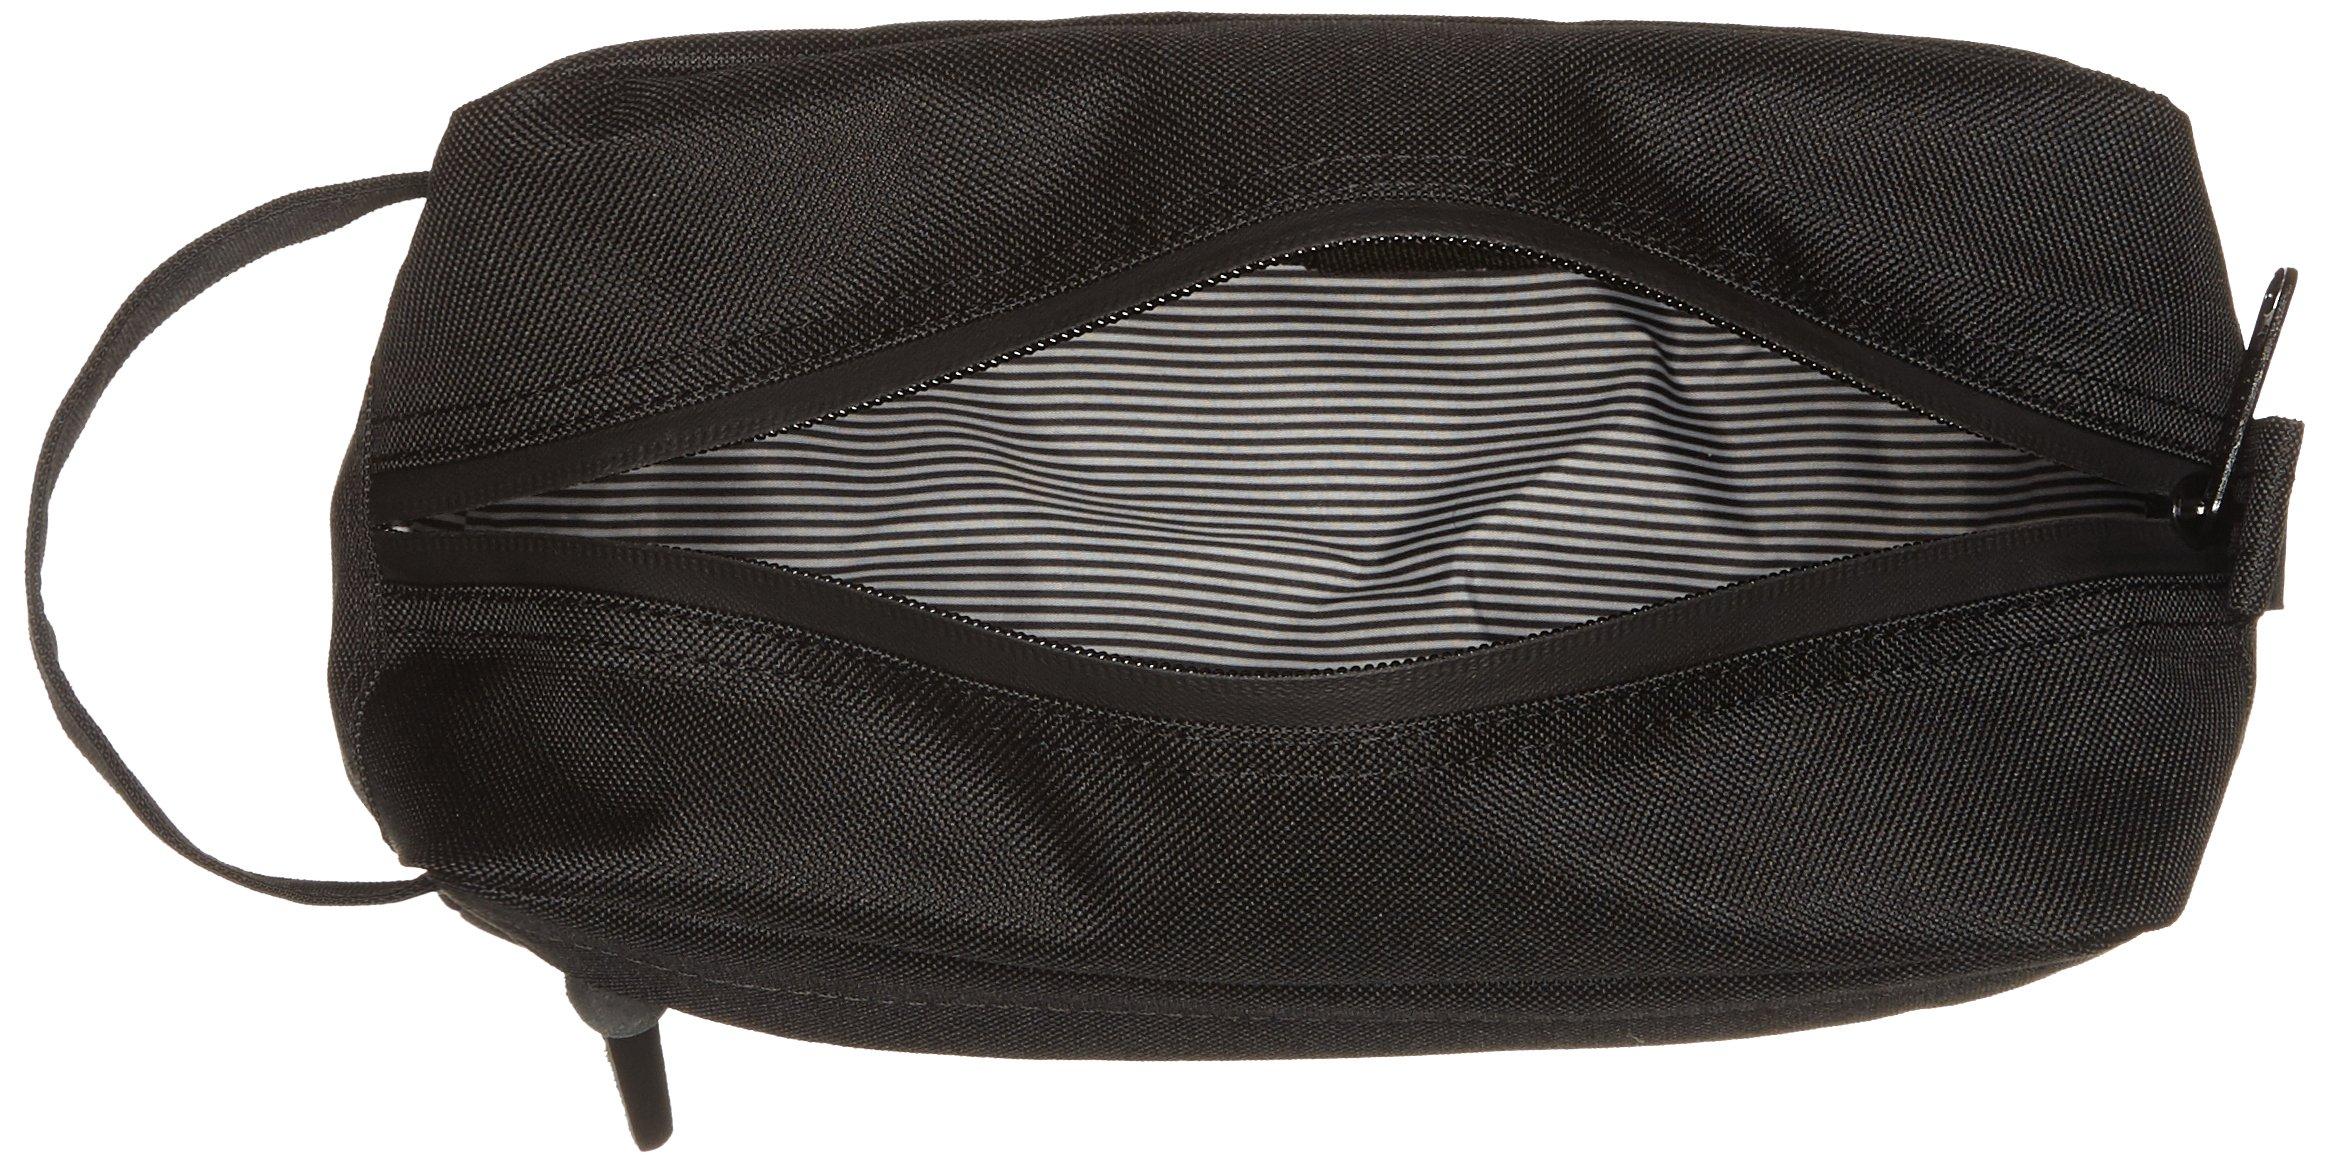 Herschel Supply Co. Chapter Travel Kit,Black,One Size by Herschel Supply Co. (Image #8)